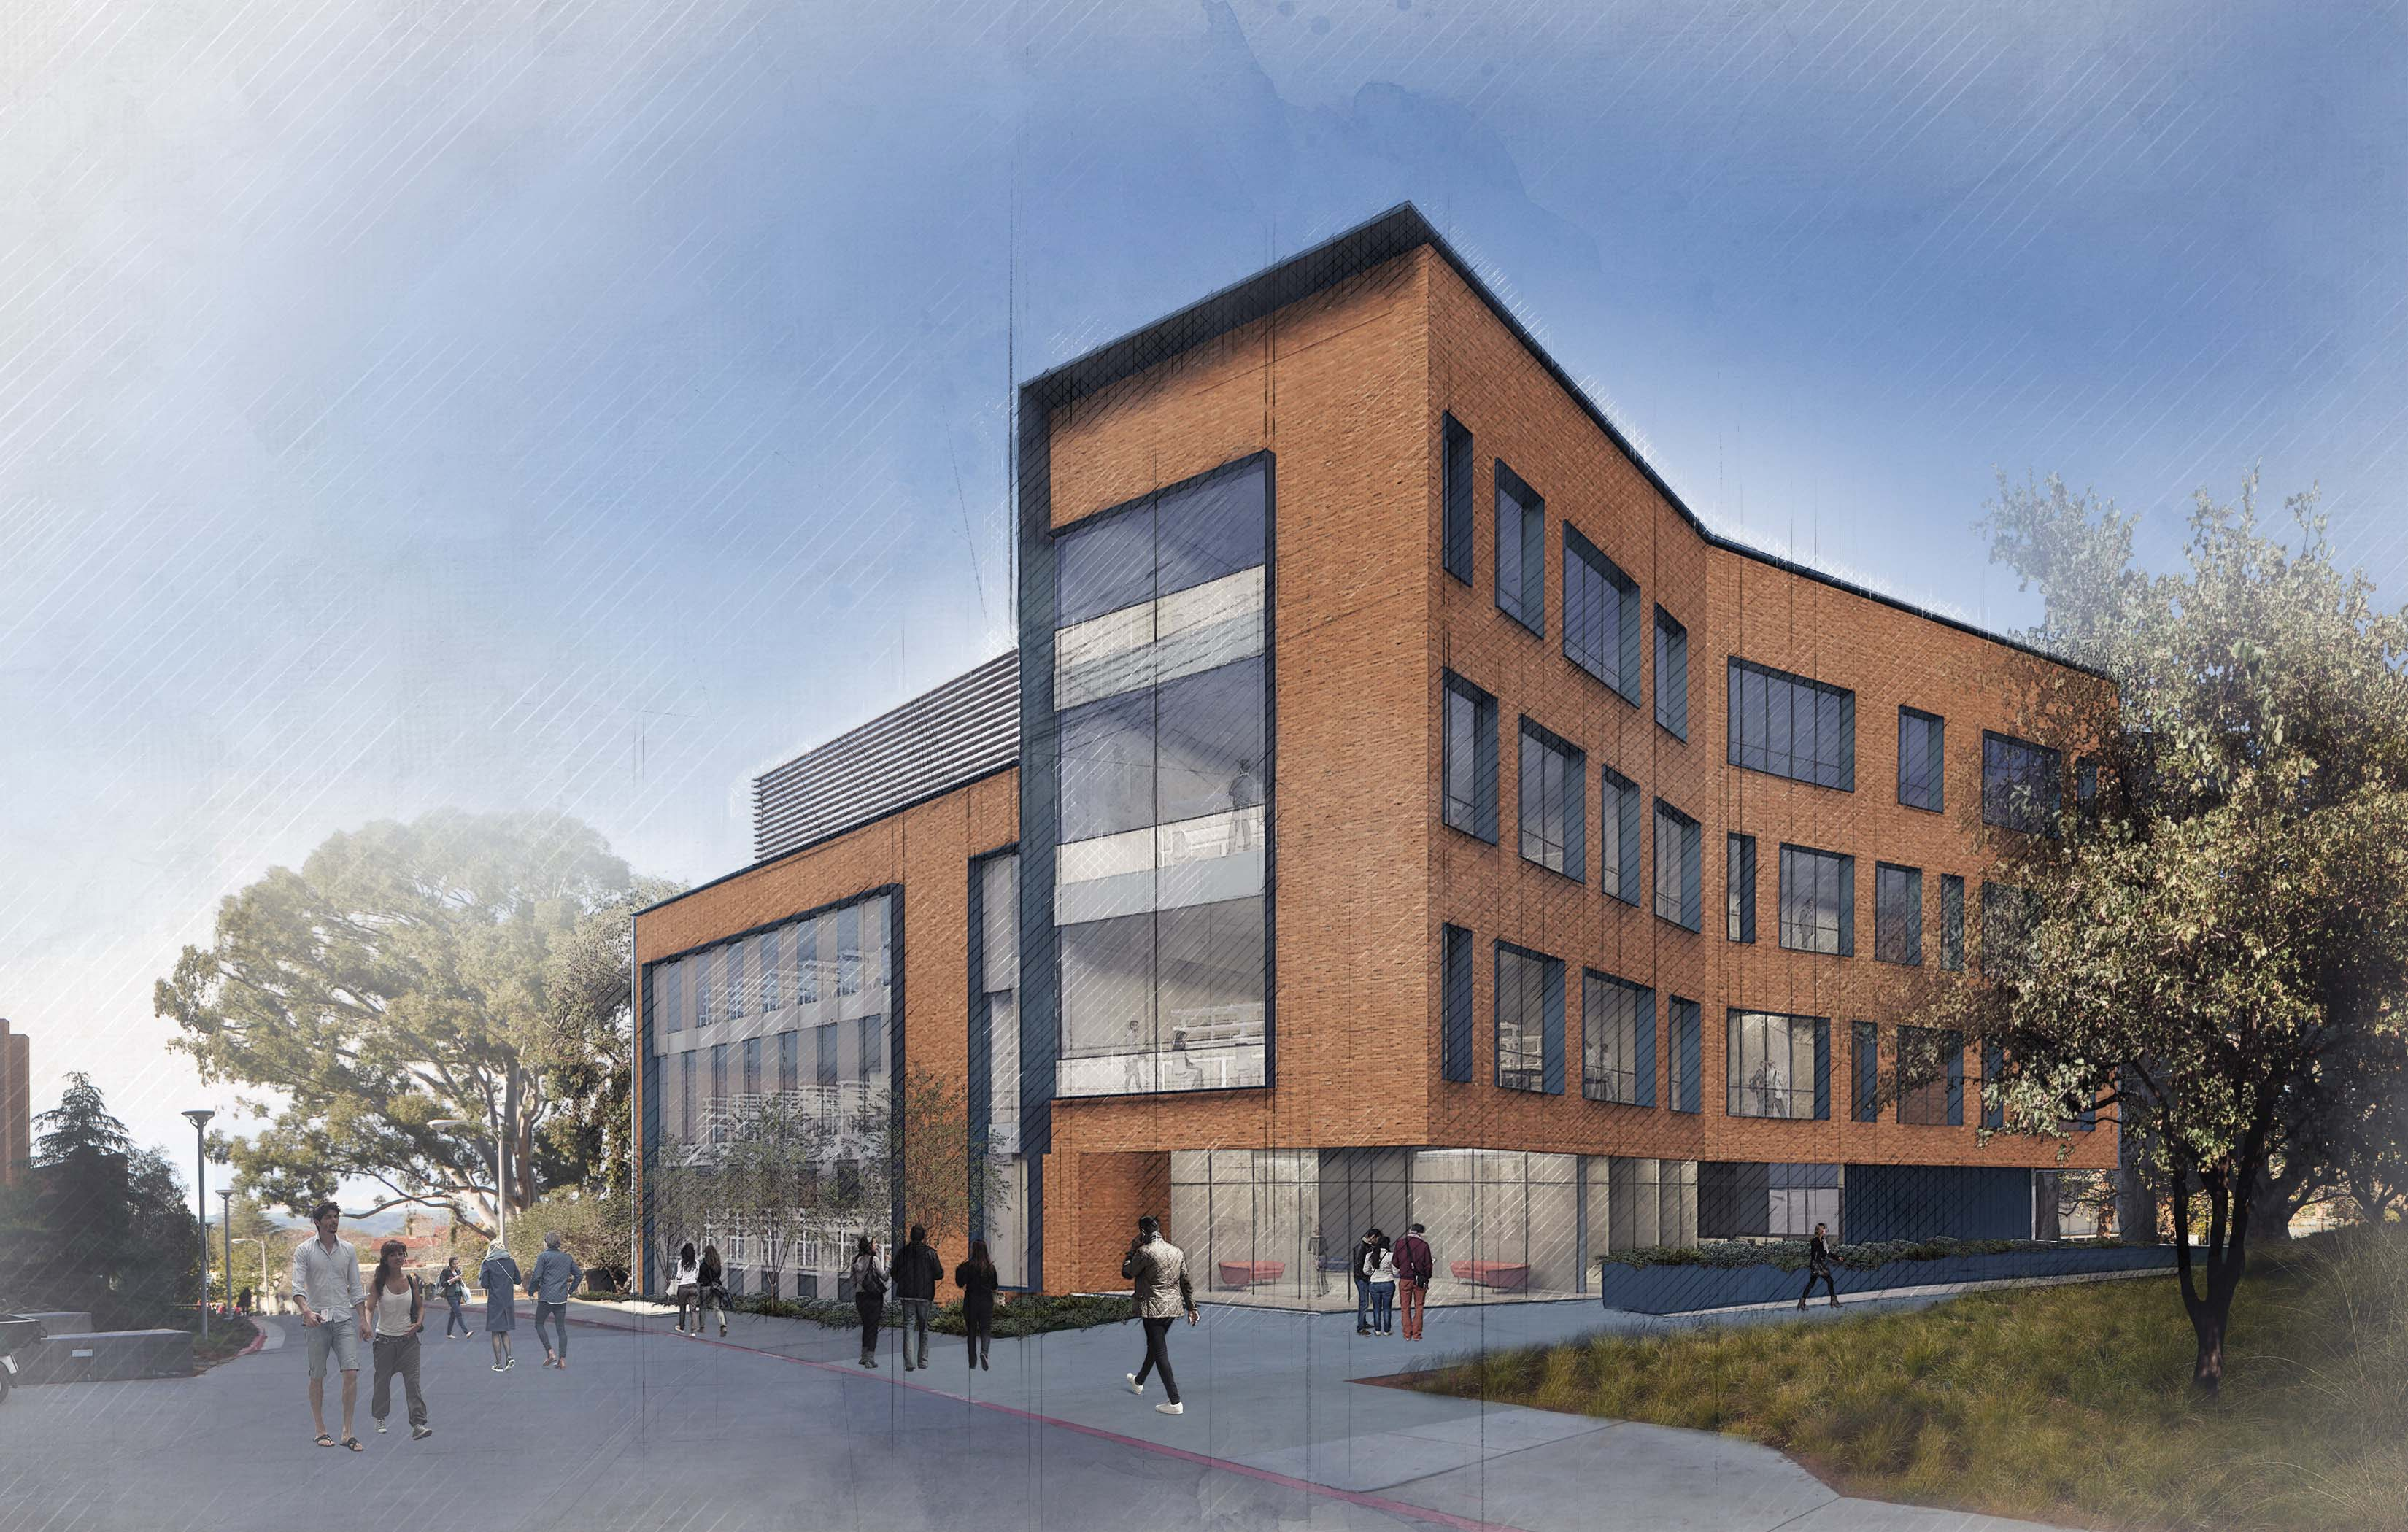 Rendering of new interdisciplinary building